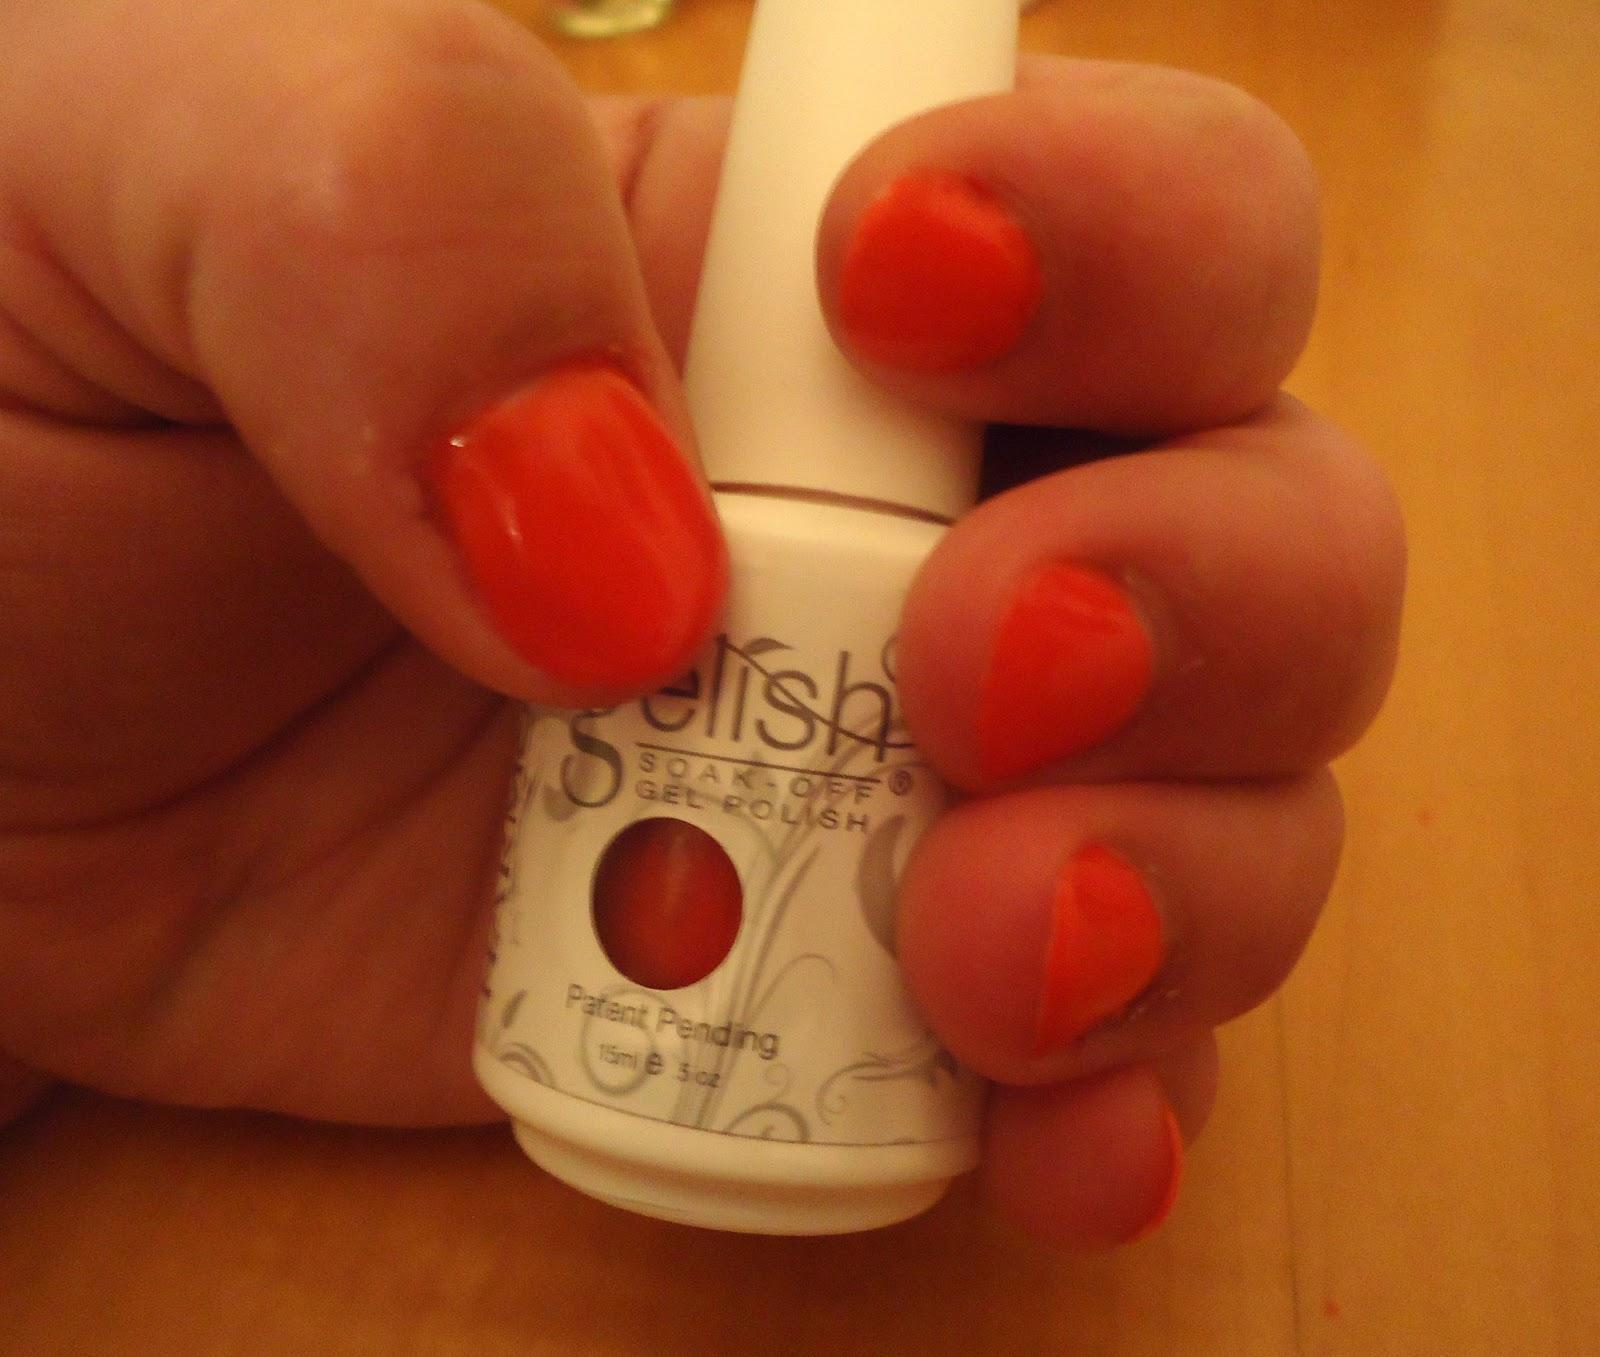 gelish / soak off gel nails tutorial